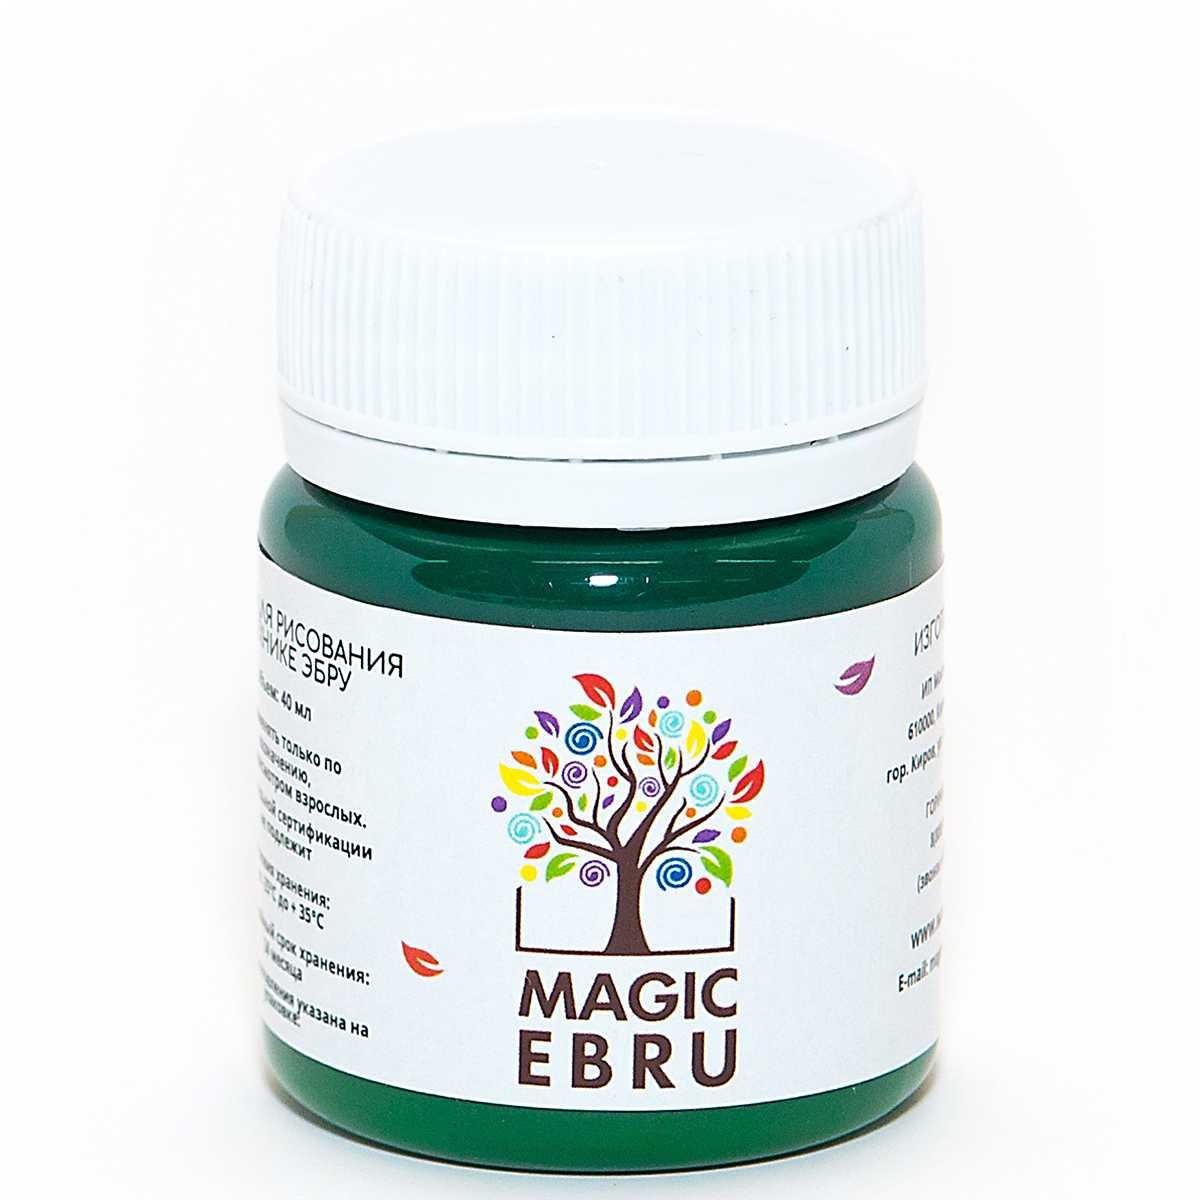 Купить Краска Magic EBRU 40 мл, зеленая, Россия